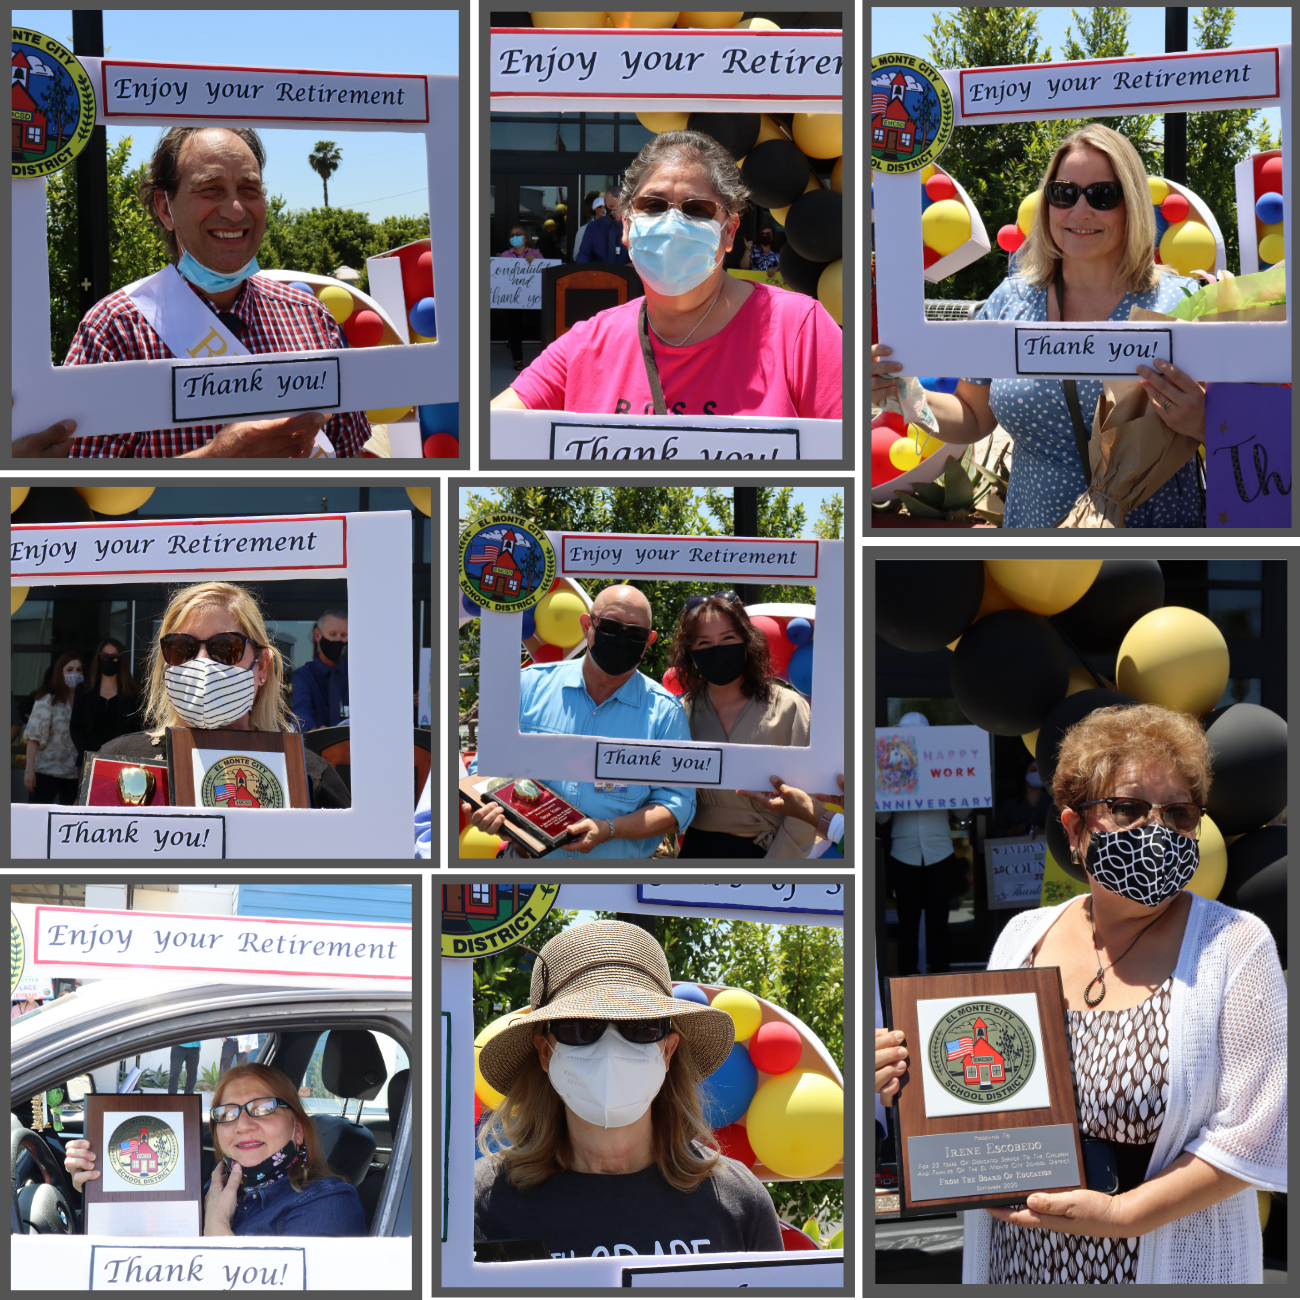 Photos of various EMCSD retirees